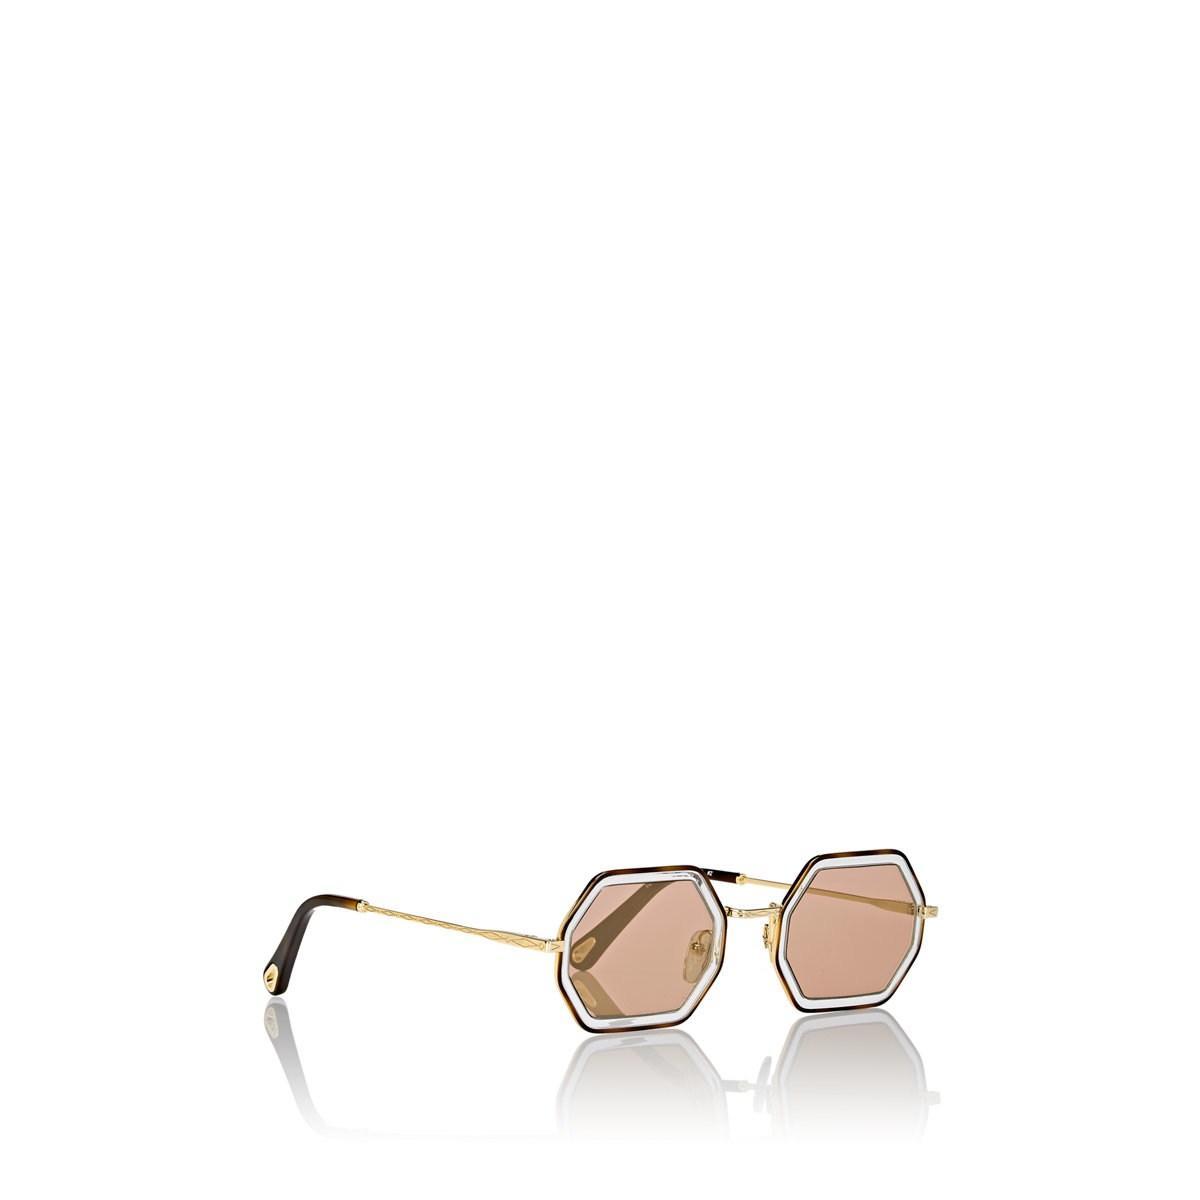 fb12fccf98d Chloé - Multicolor Tally Small Sunglasses - 253 - Lyst. View fullscreen